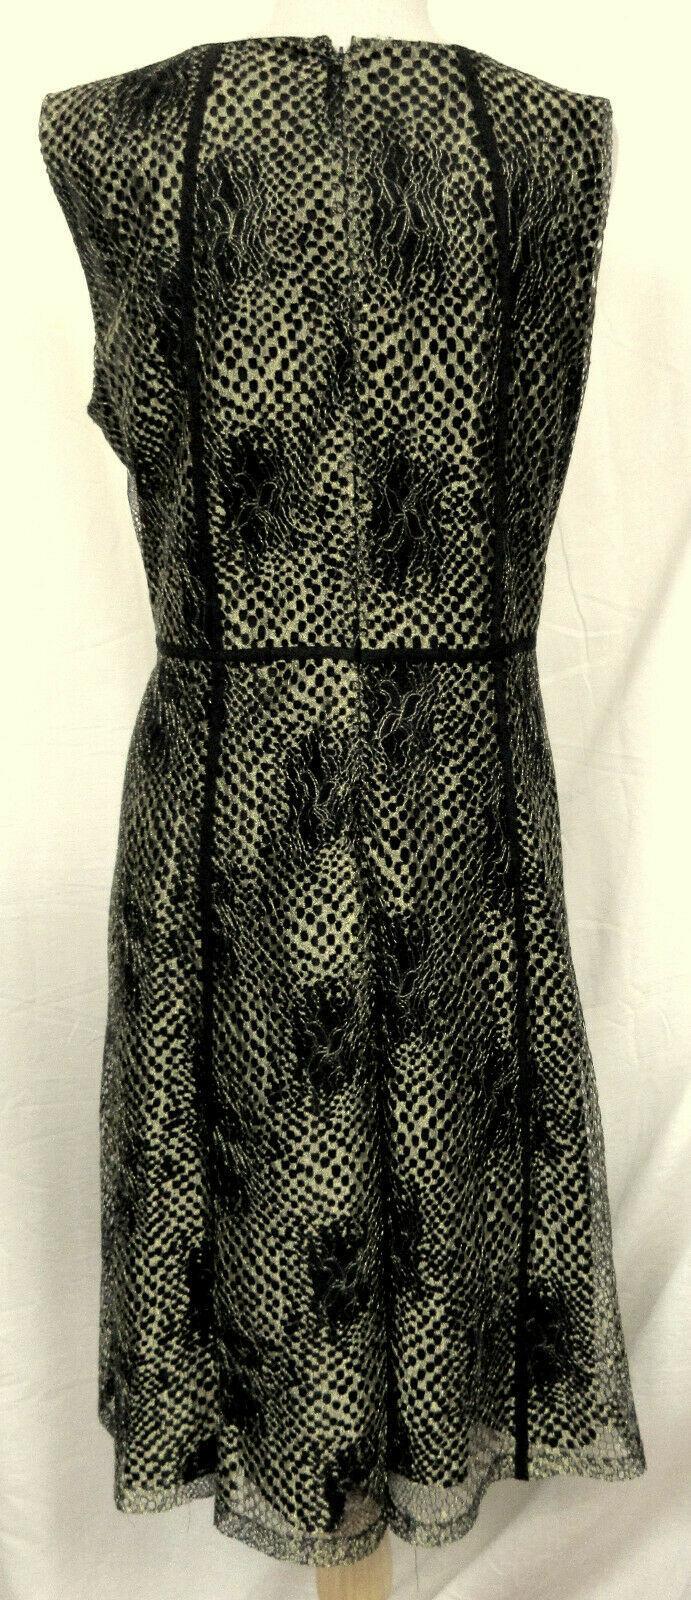 ANNE KLEIN Sleeveless Lace Fit n' Flare Gold Megtallic Overlay Black Dress 16W